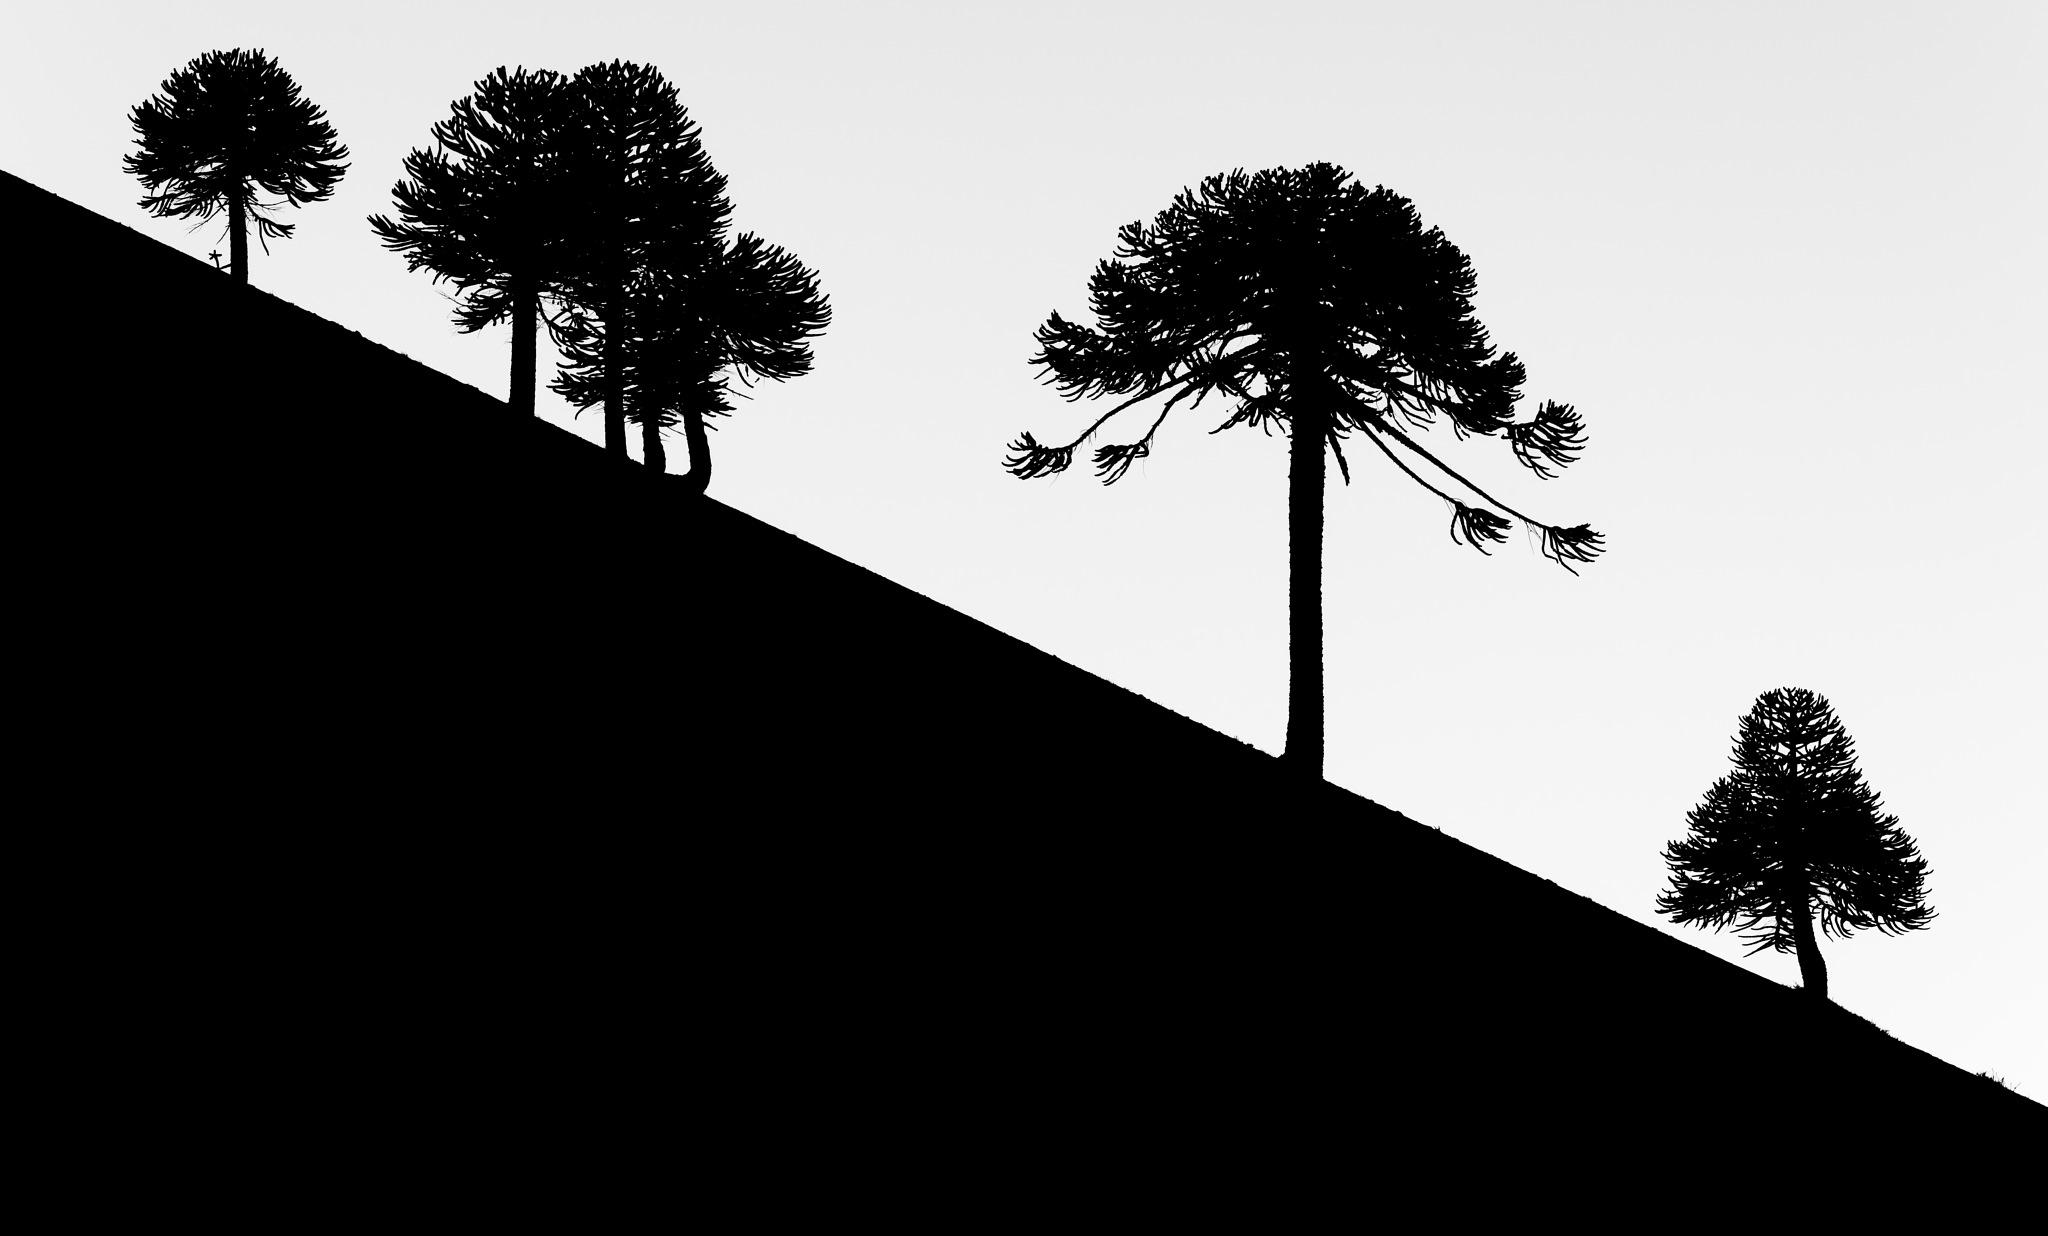 Araucarias by Francisco Negroni